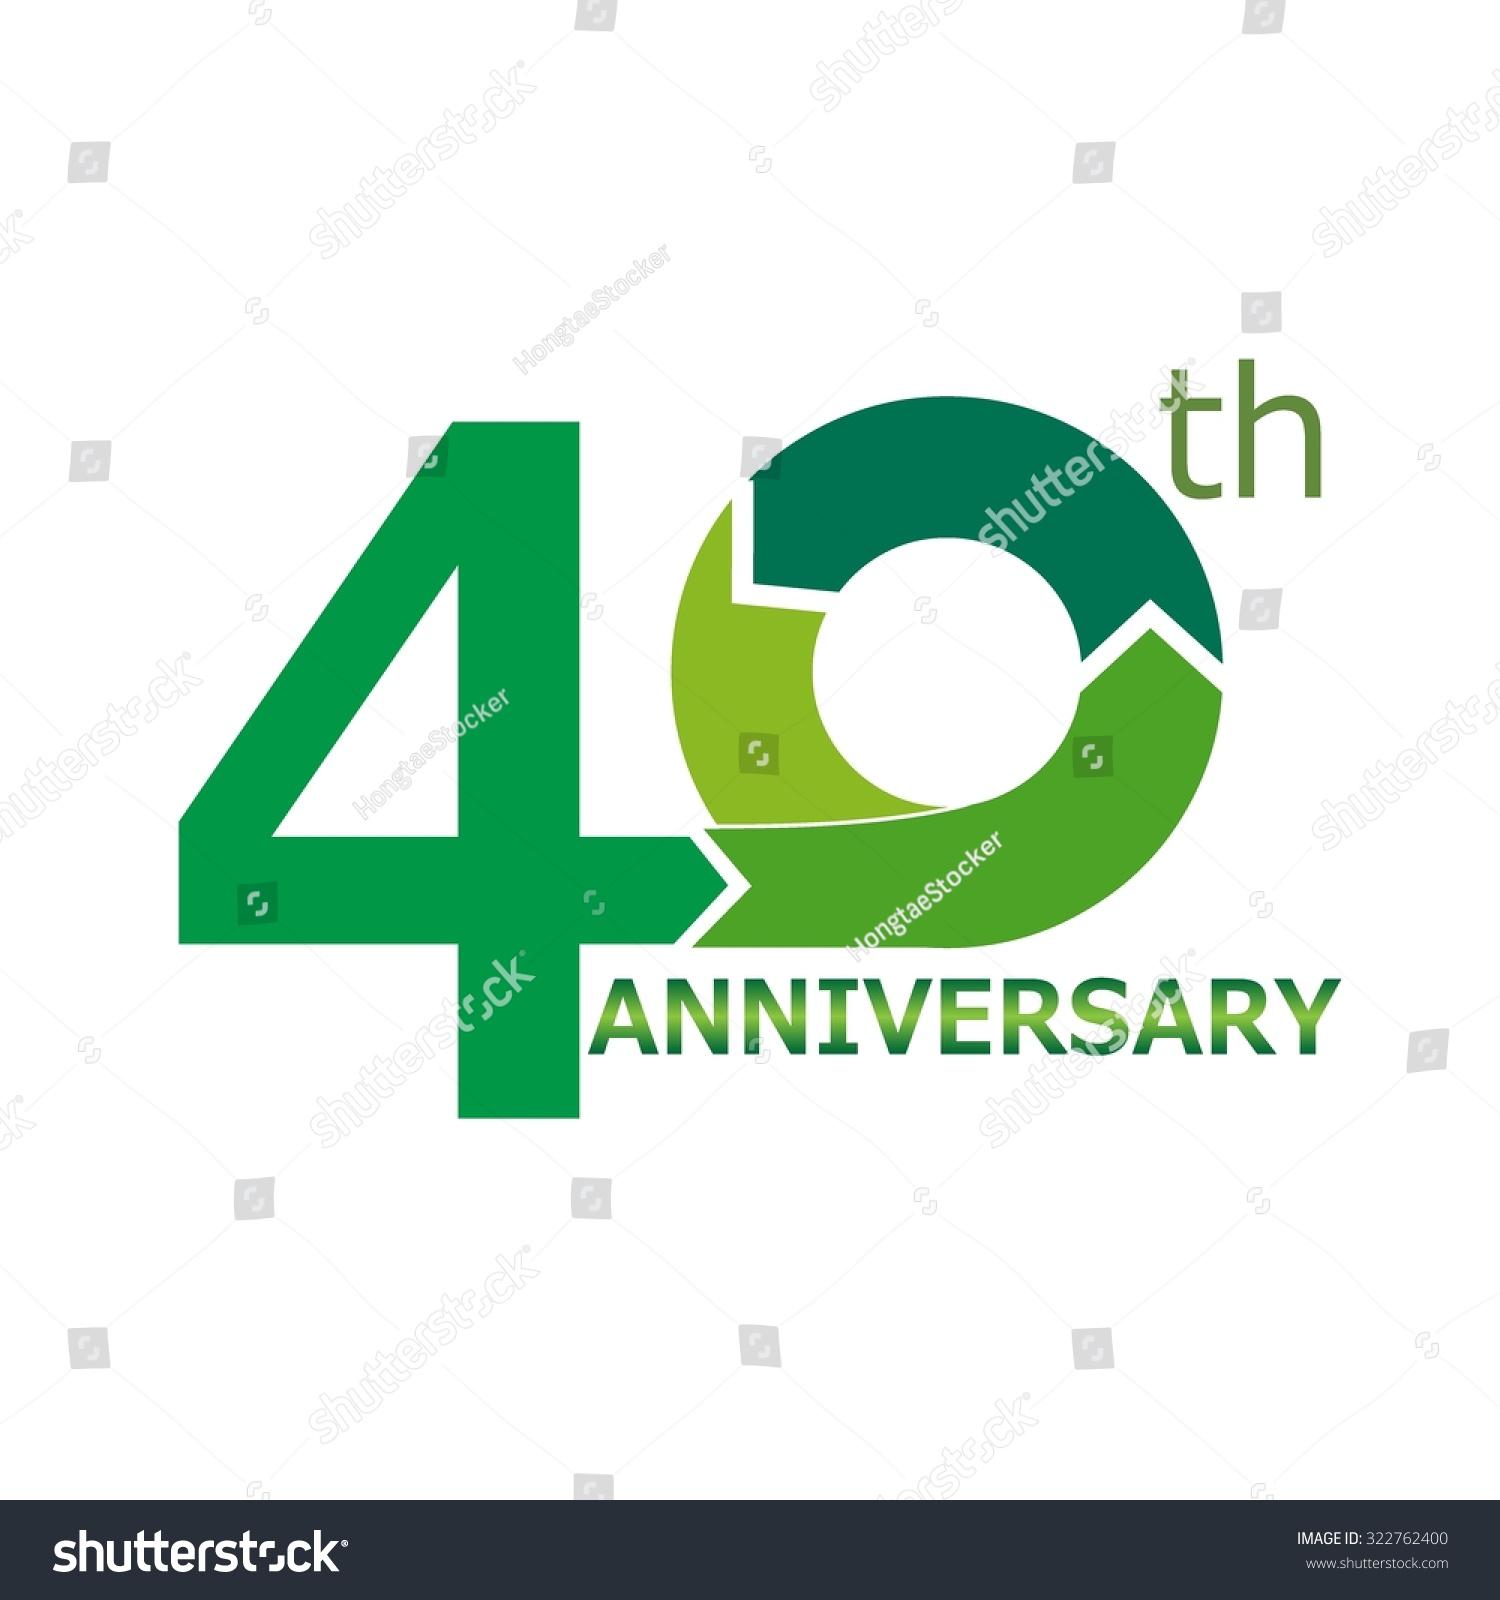 Template logo th anniversary stock vector